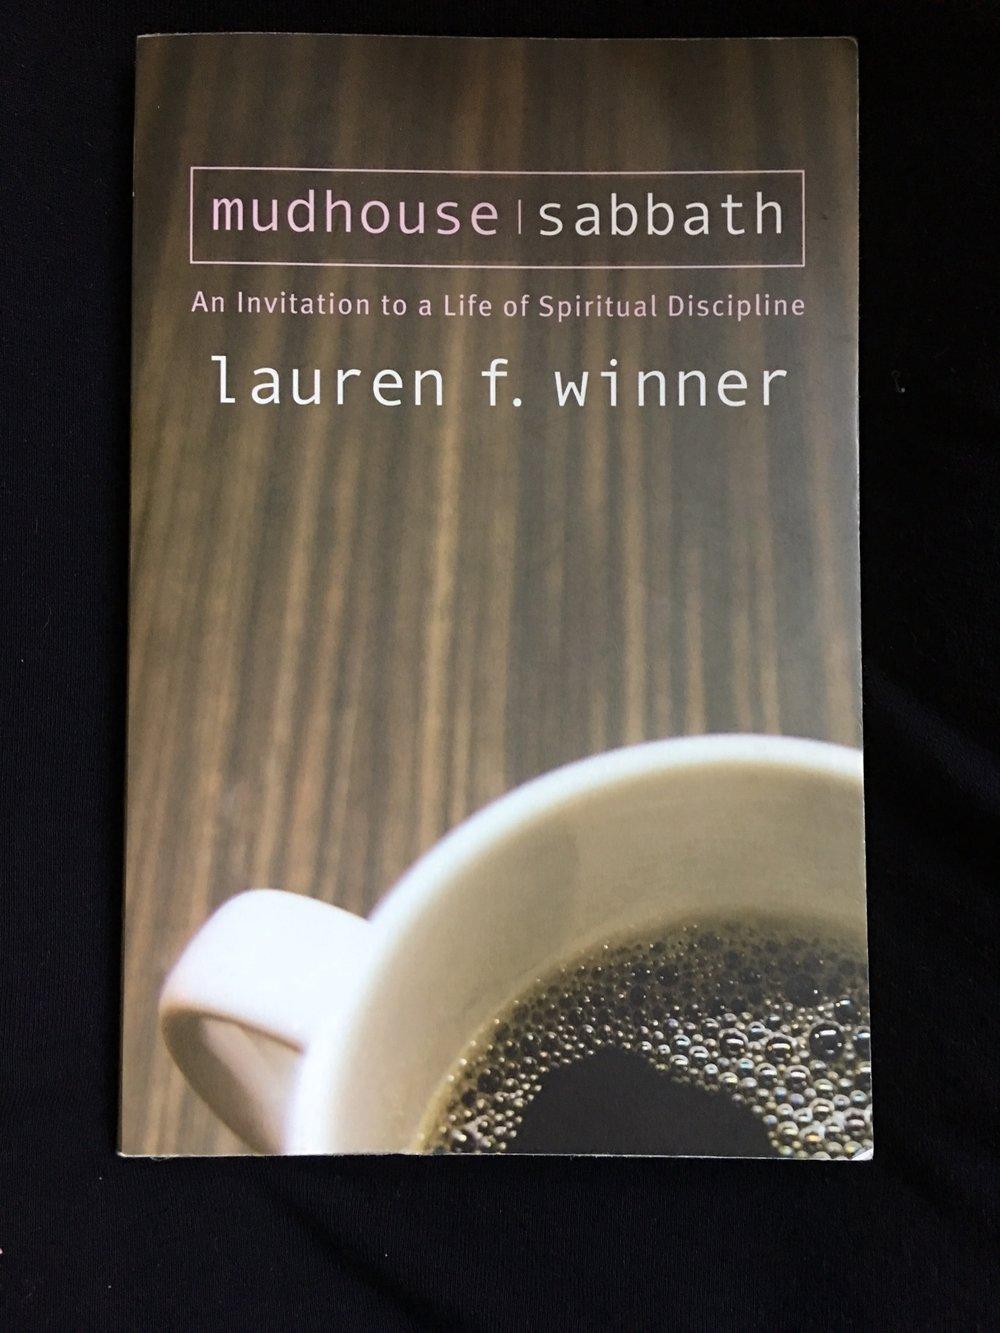 mudhouse sabbath.JPG